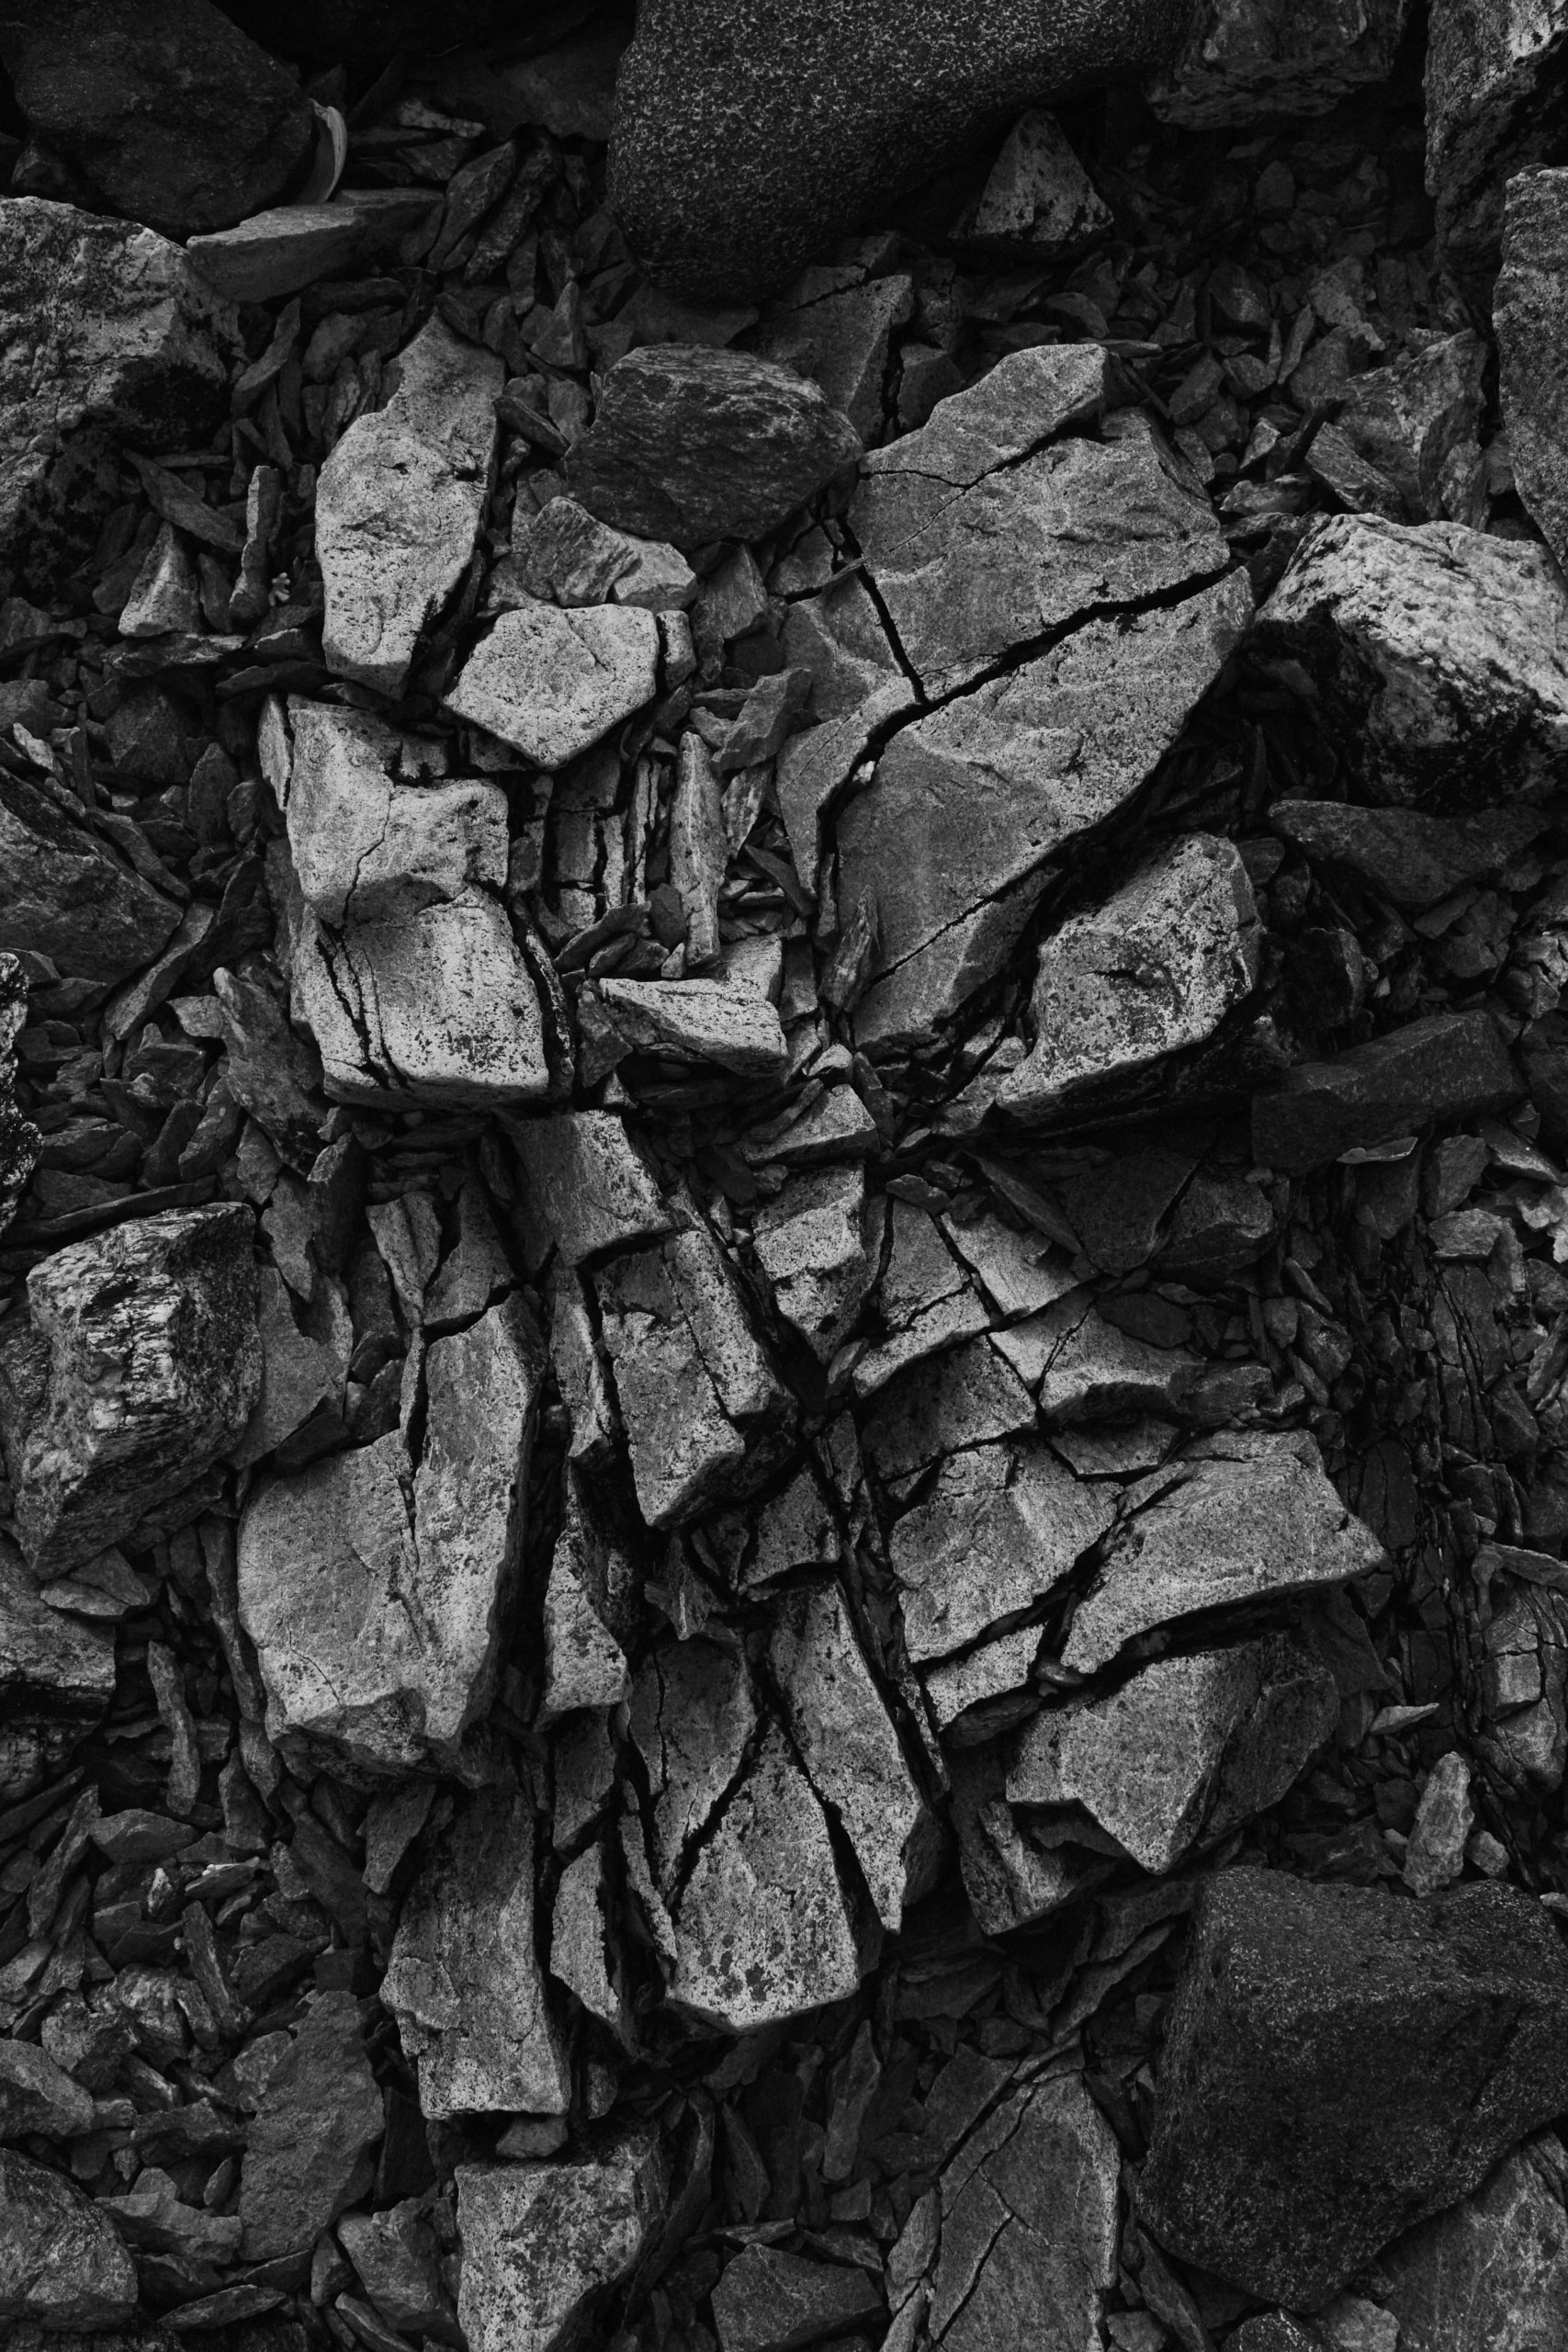 Pernille Sandberg – Isolation